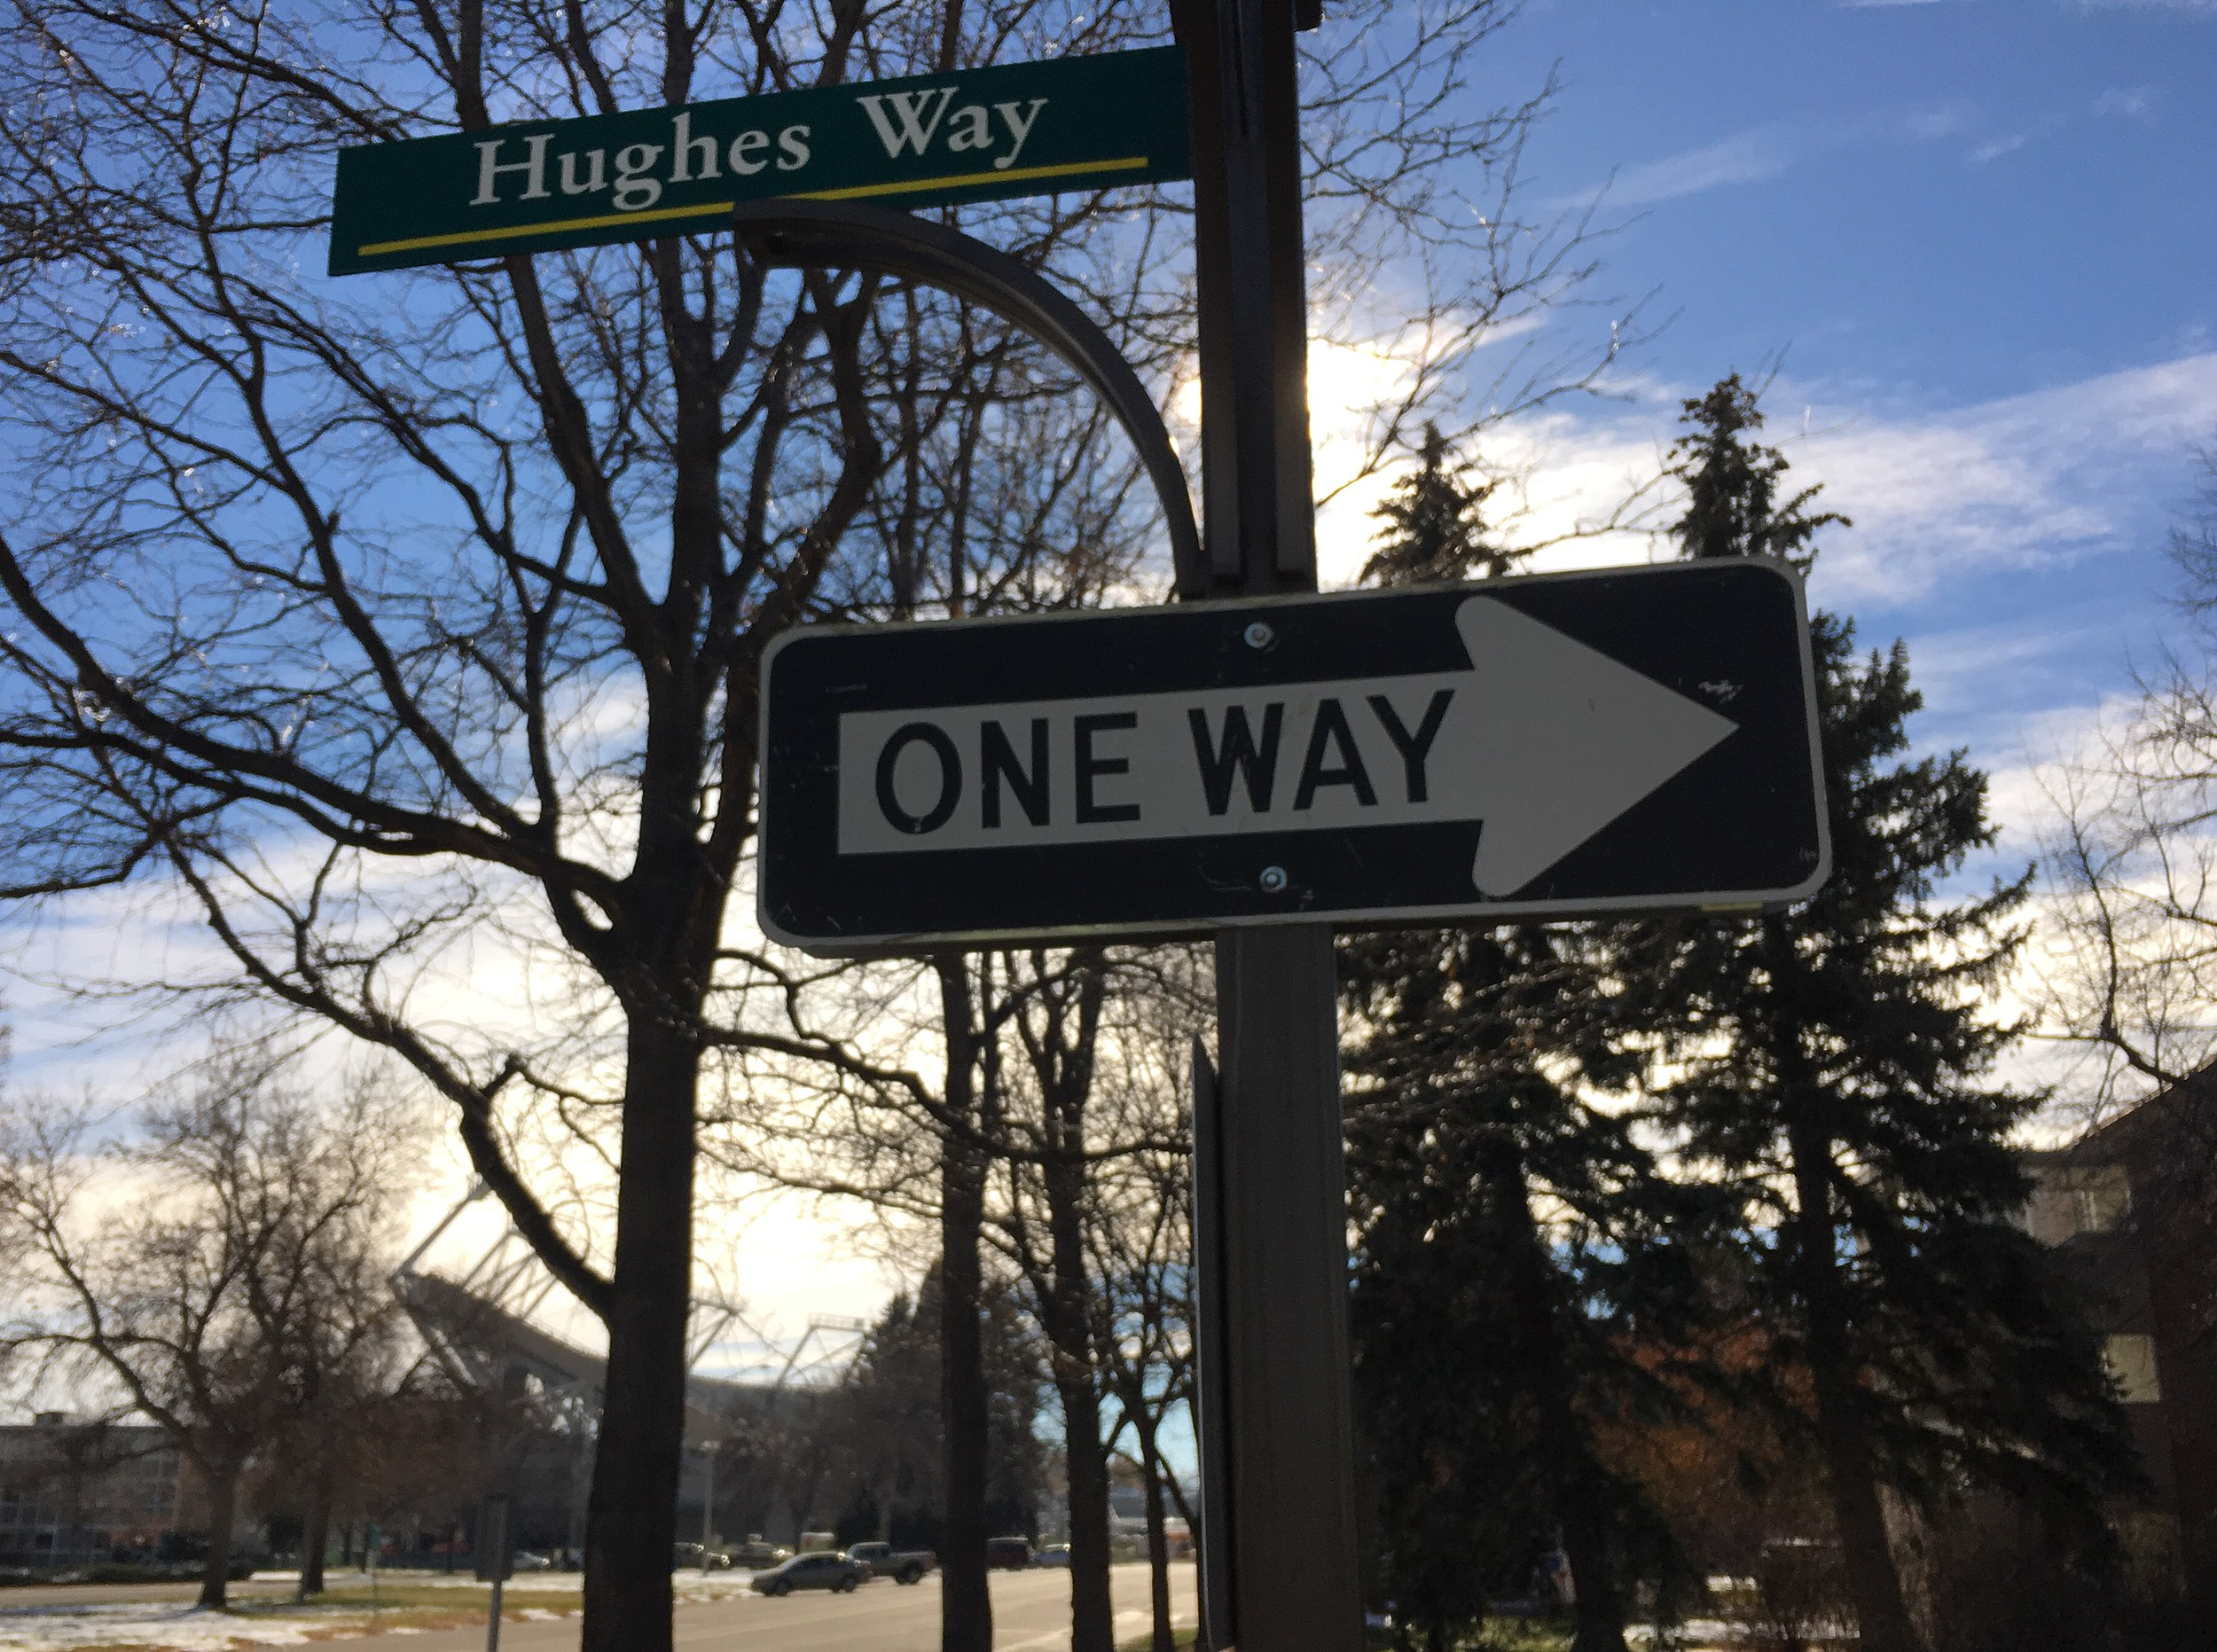 Street on CSU campus named Hughes Way